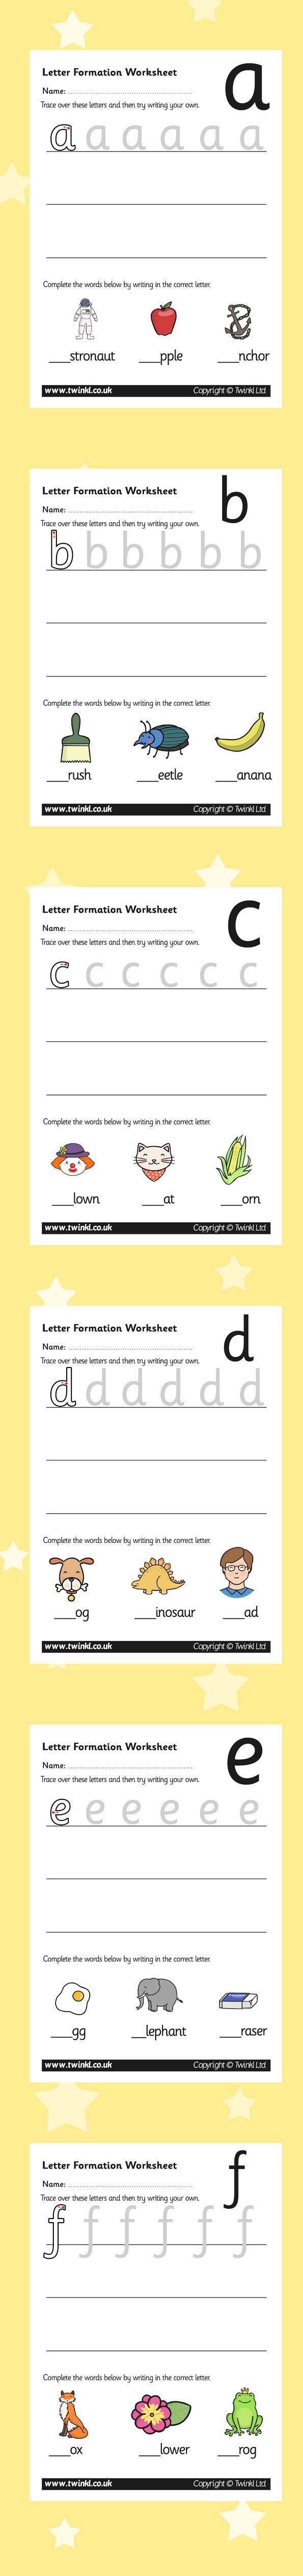 8 best Worksheets images on Pinterest | Vorschulideen, Briefe lehren ...